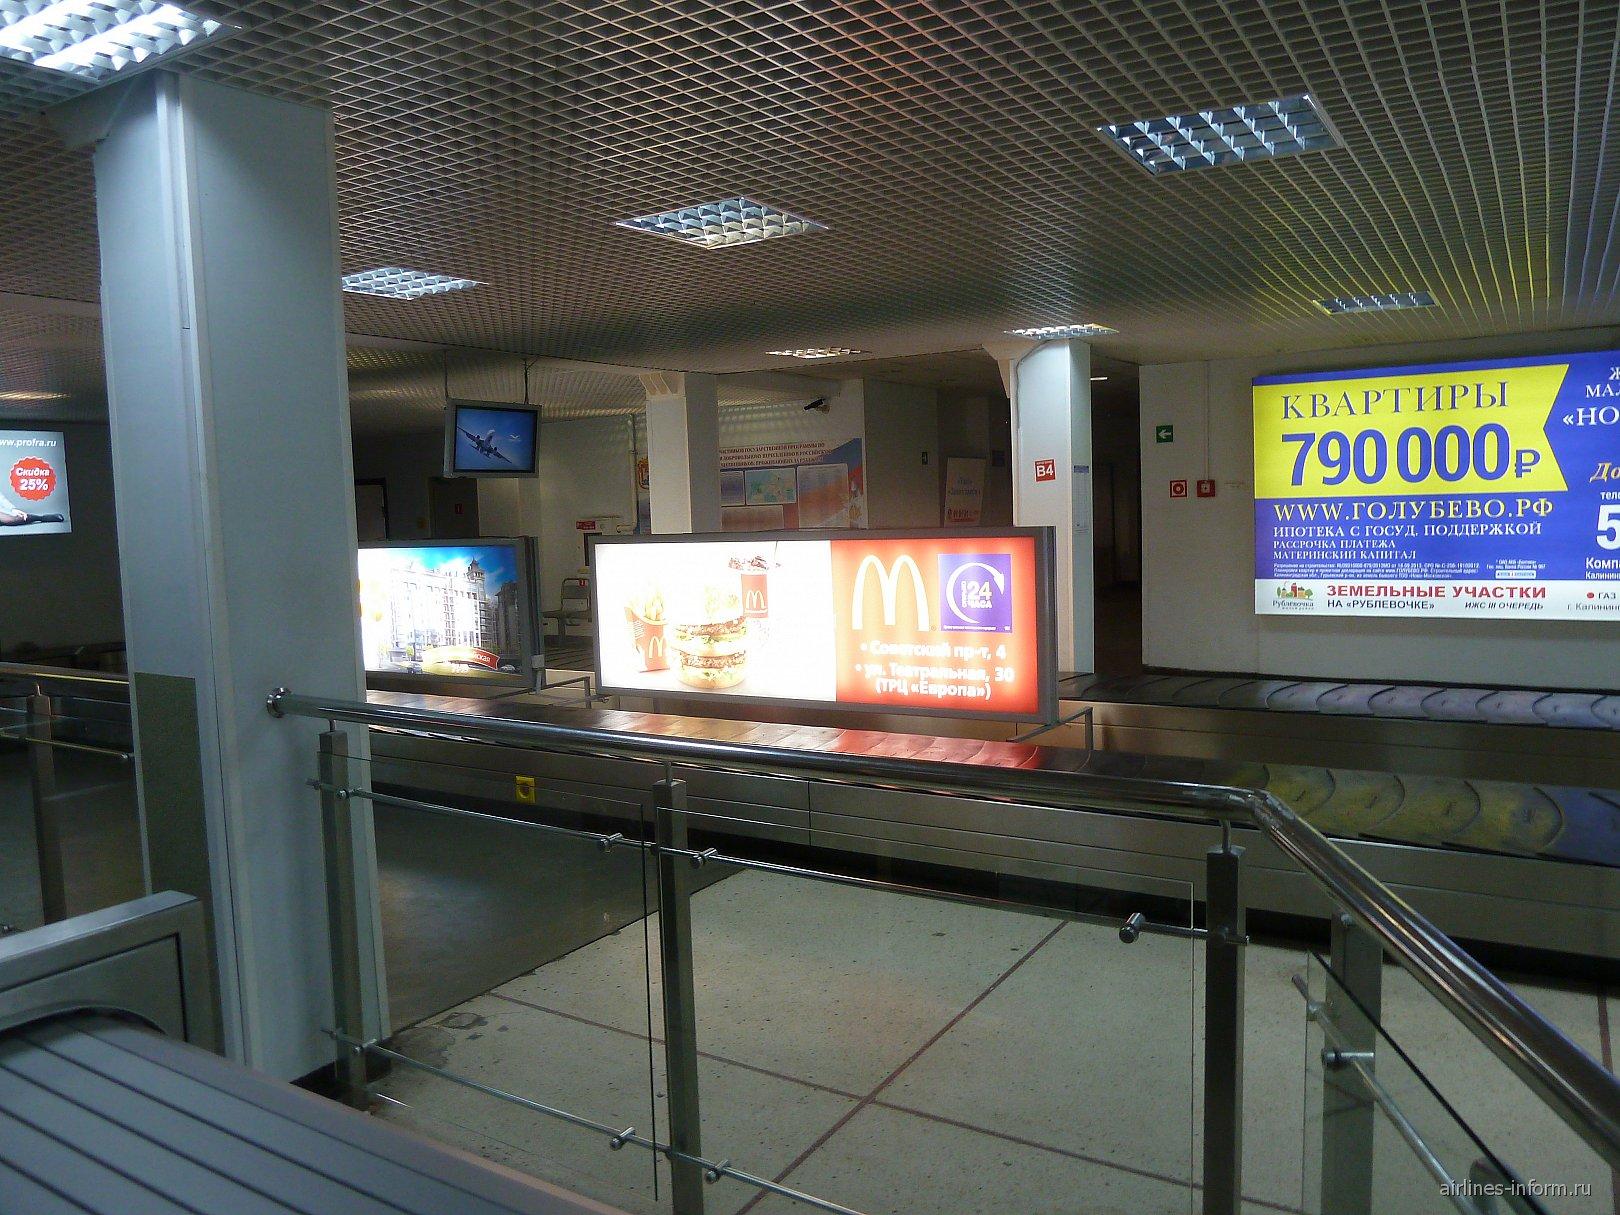 Зал выдачи багажа в аэропорту Калининград Храброво